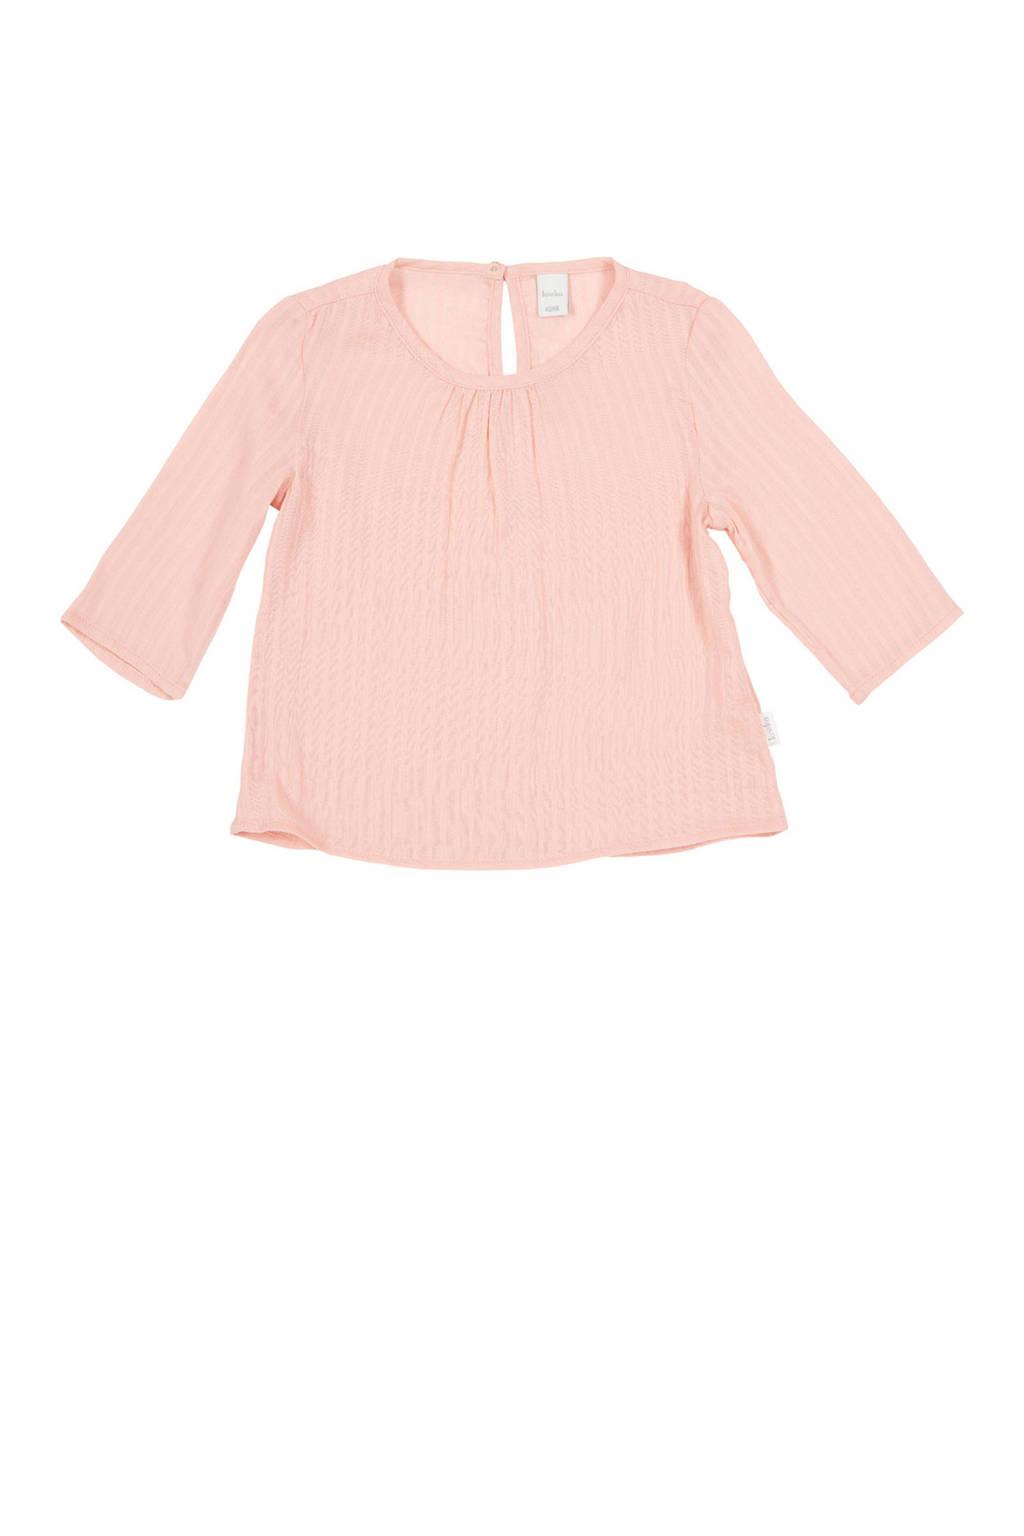 Koeka newborn baby top Dancing Dobby roze, Roze